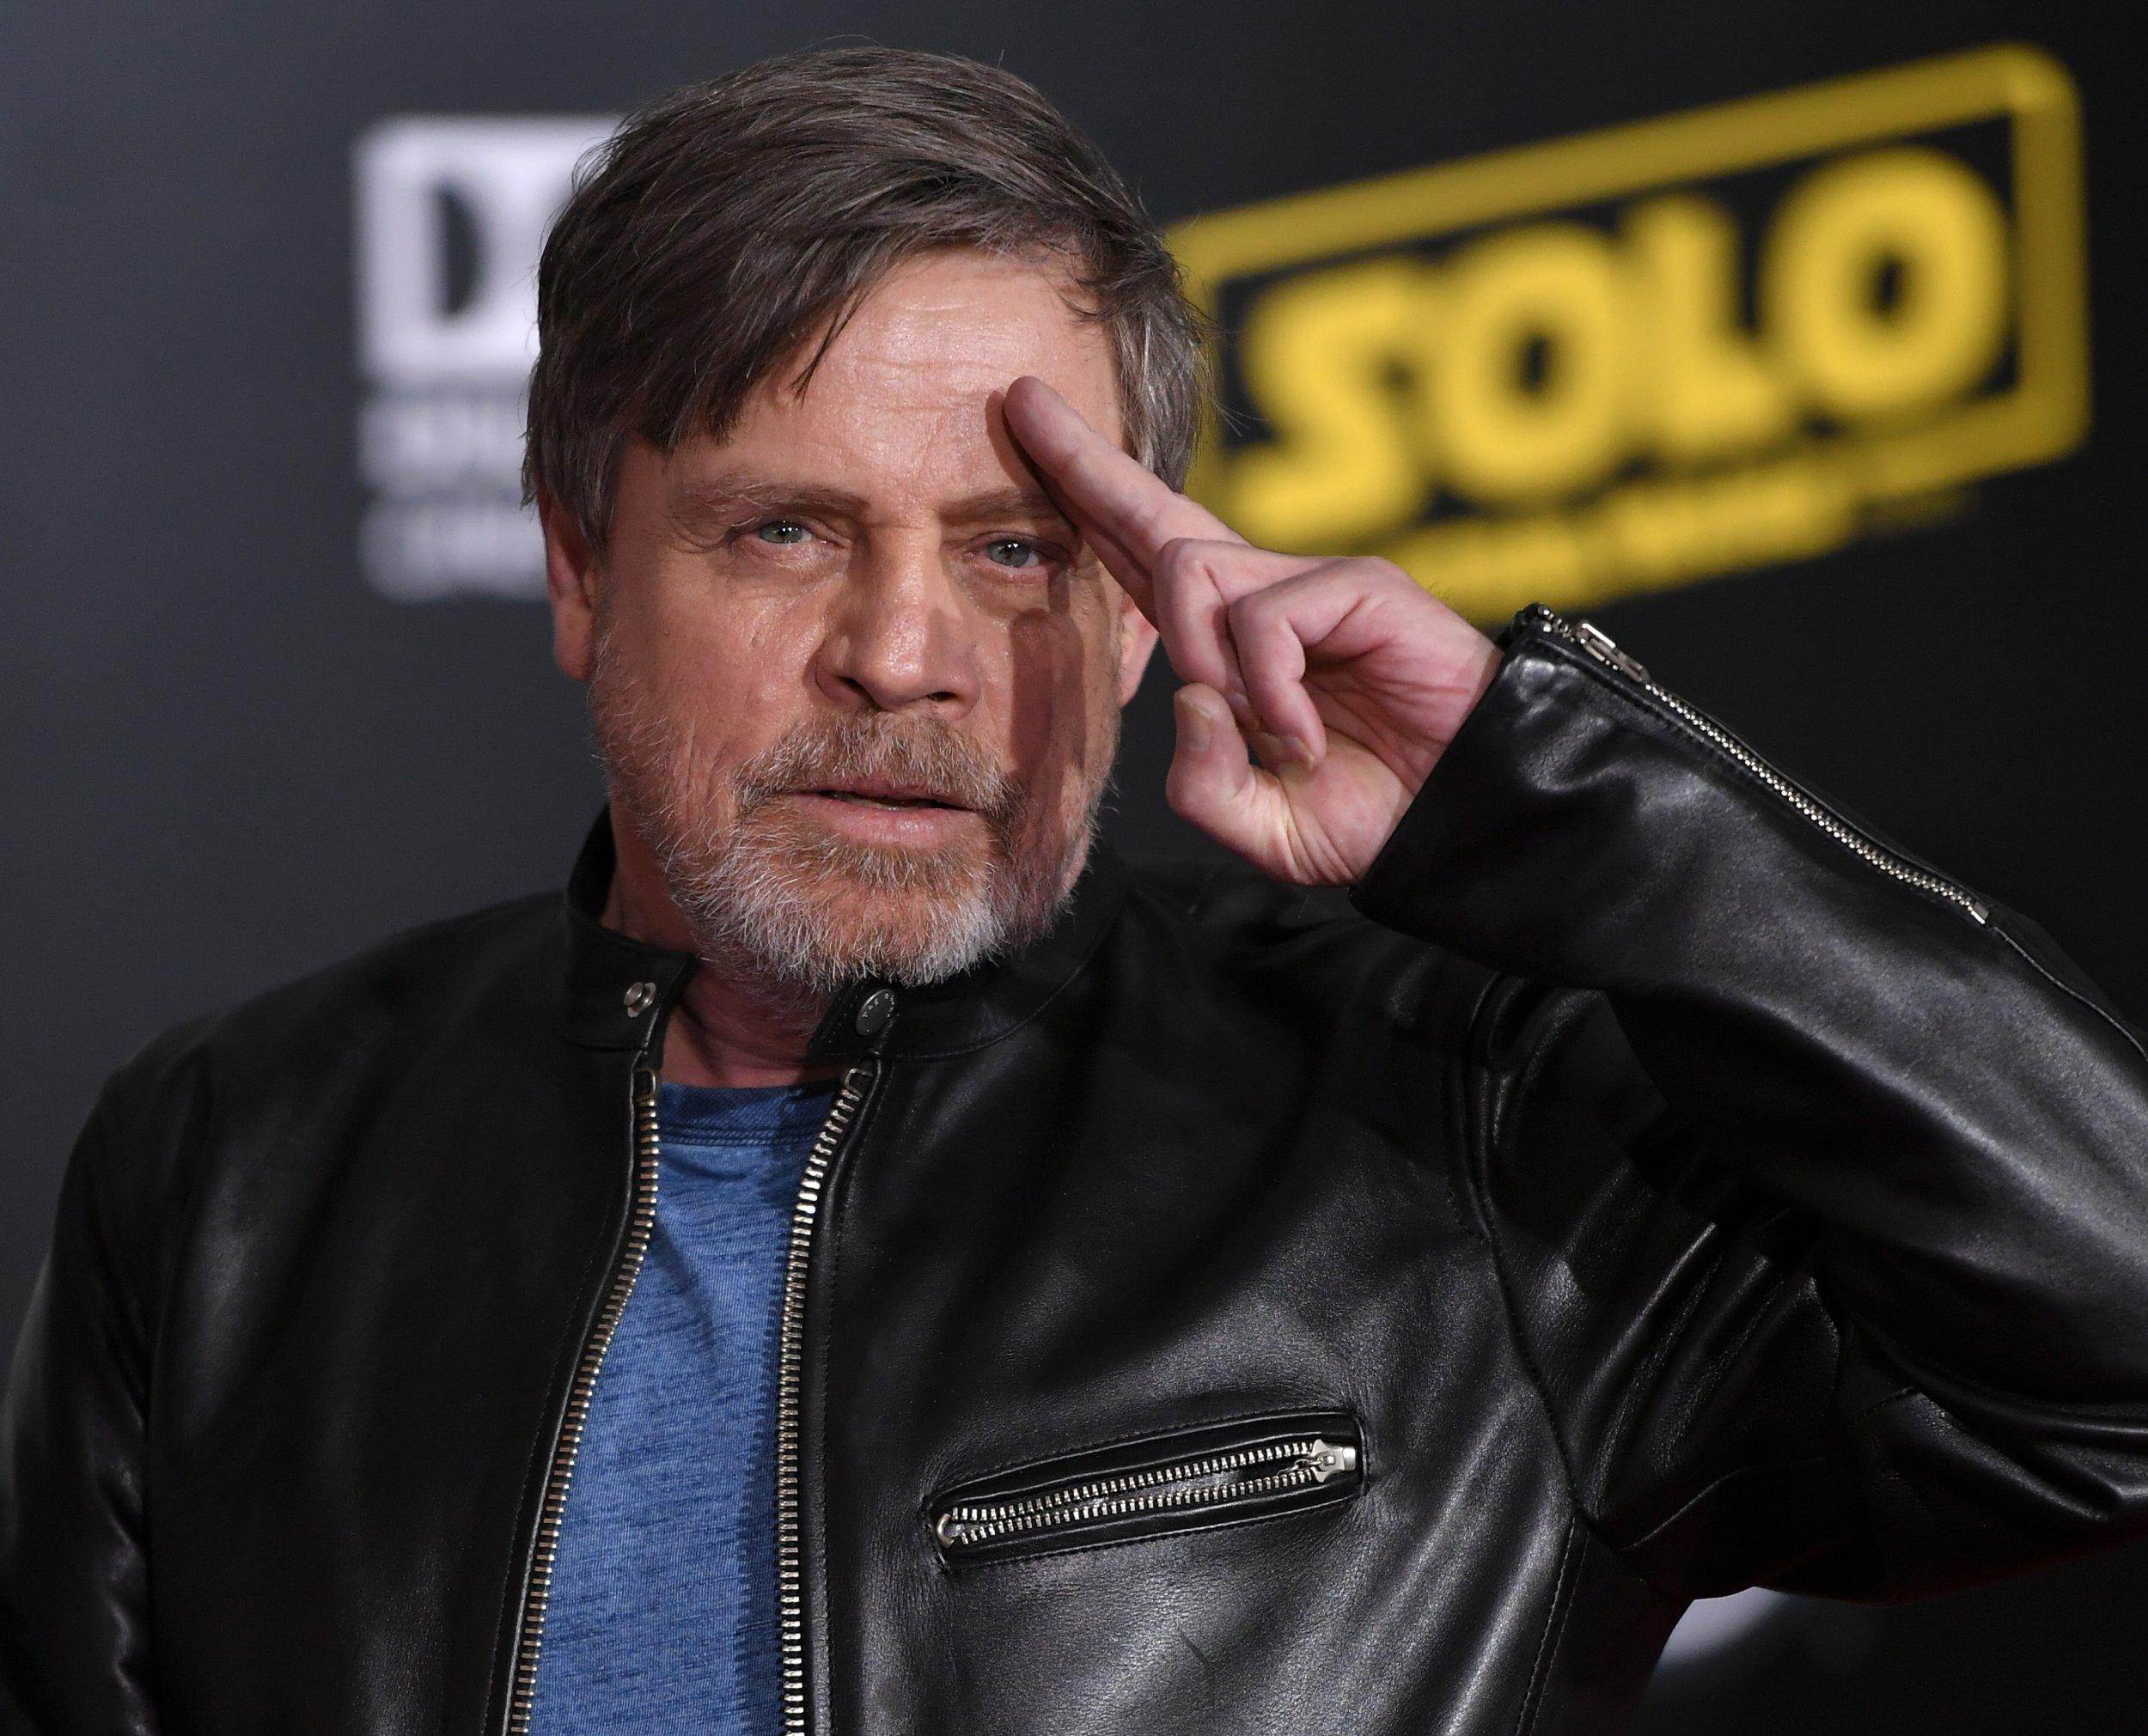 Security around Star Wars 9 is actually insane as Mark Hamill reveals crazy precautions for next saga